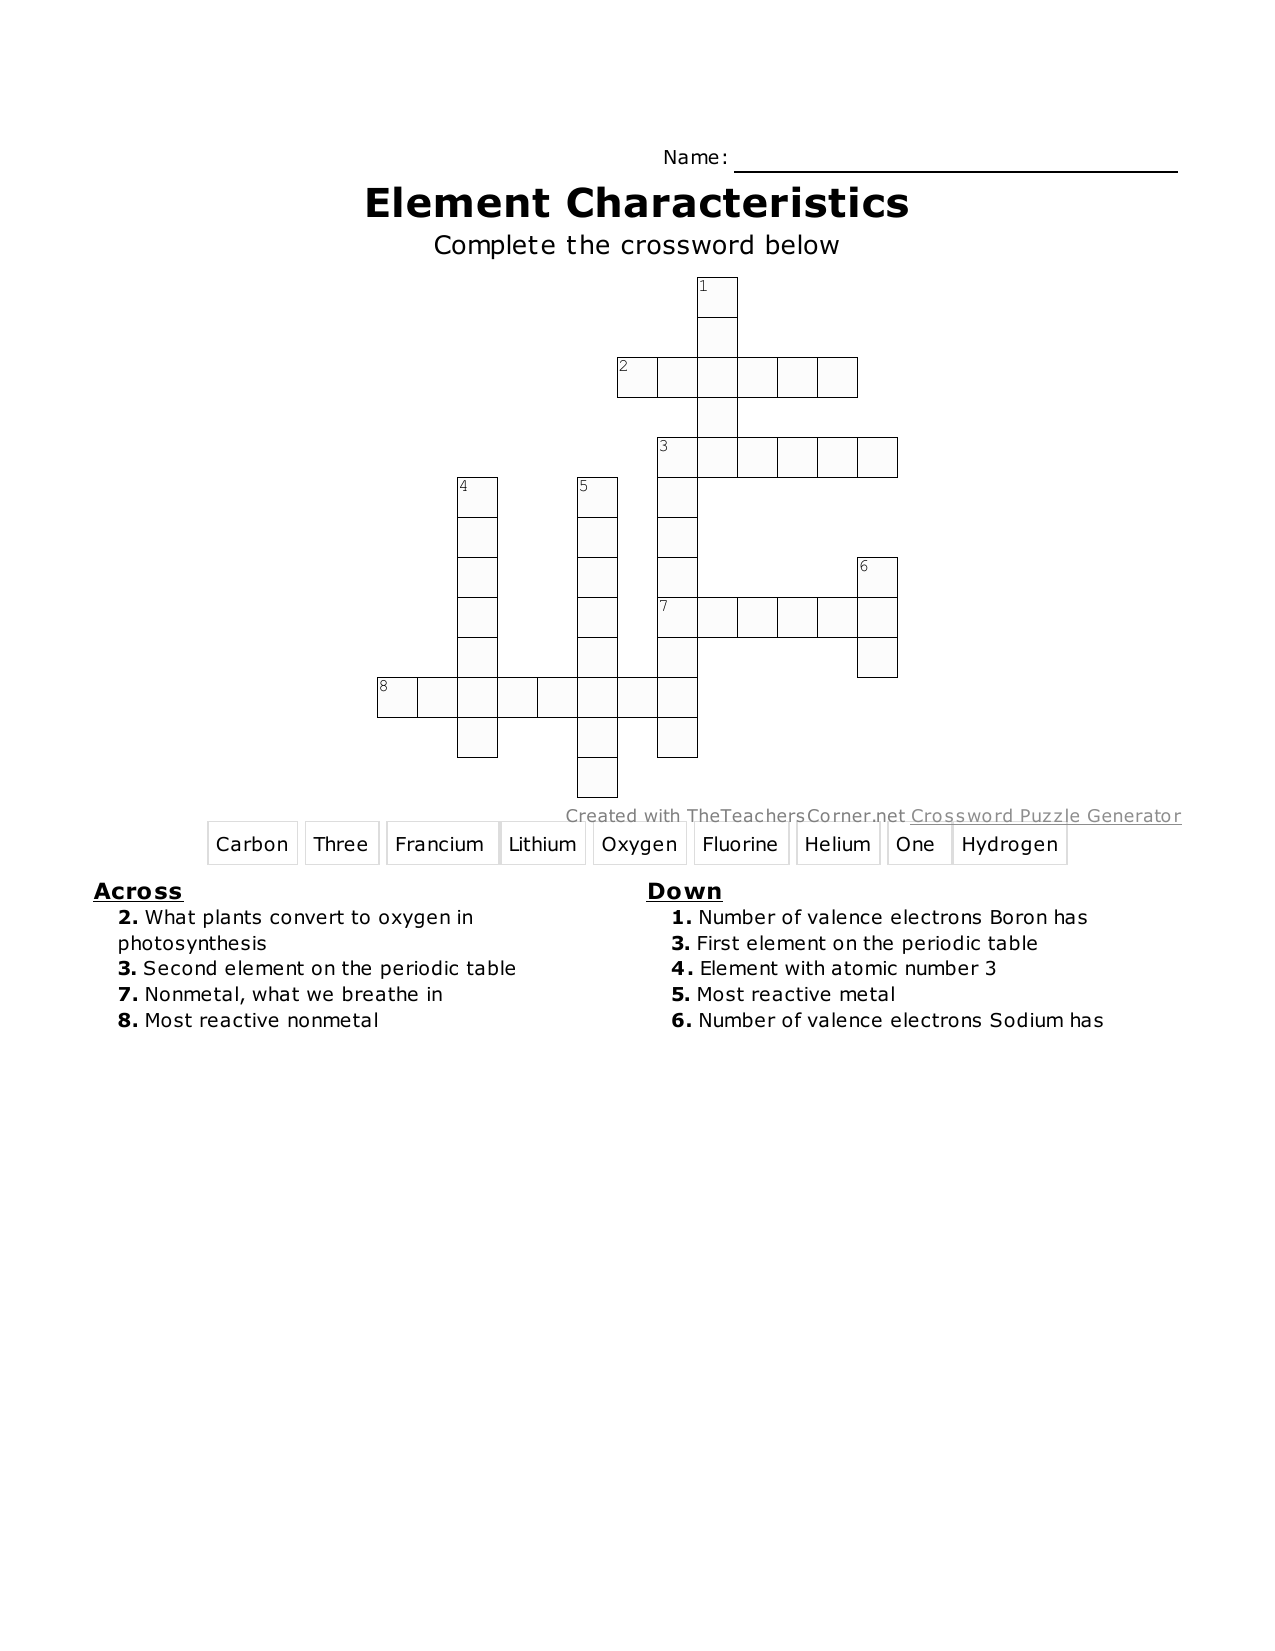 Element Characteristics